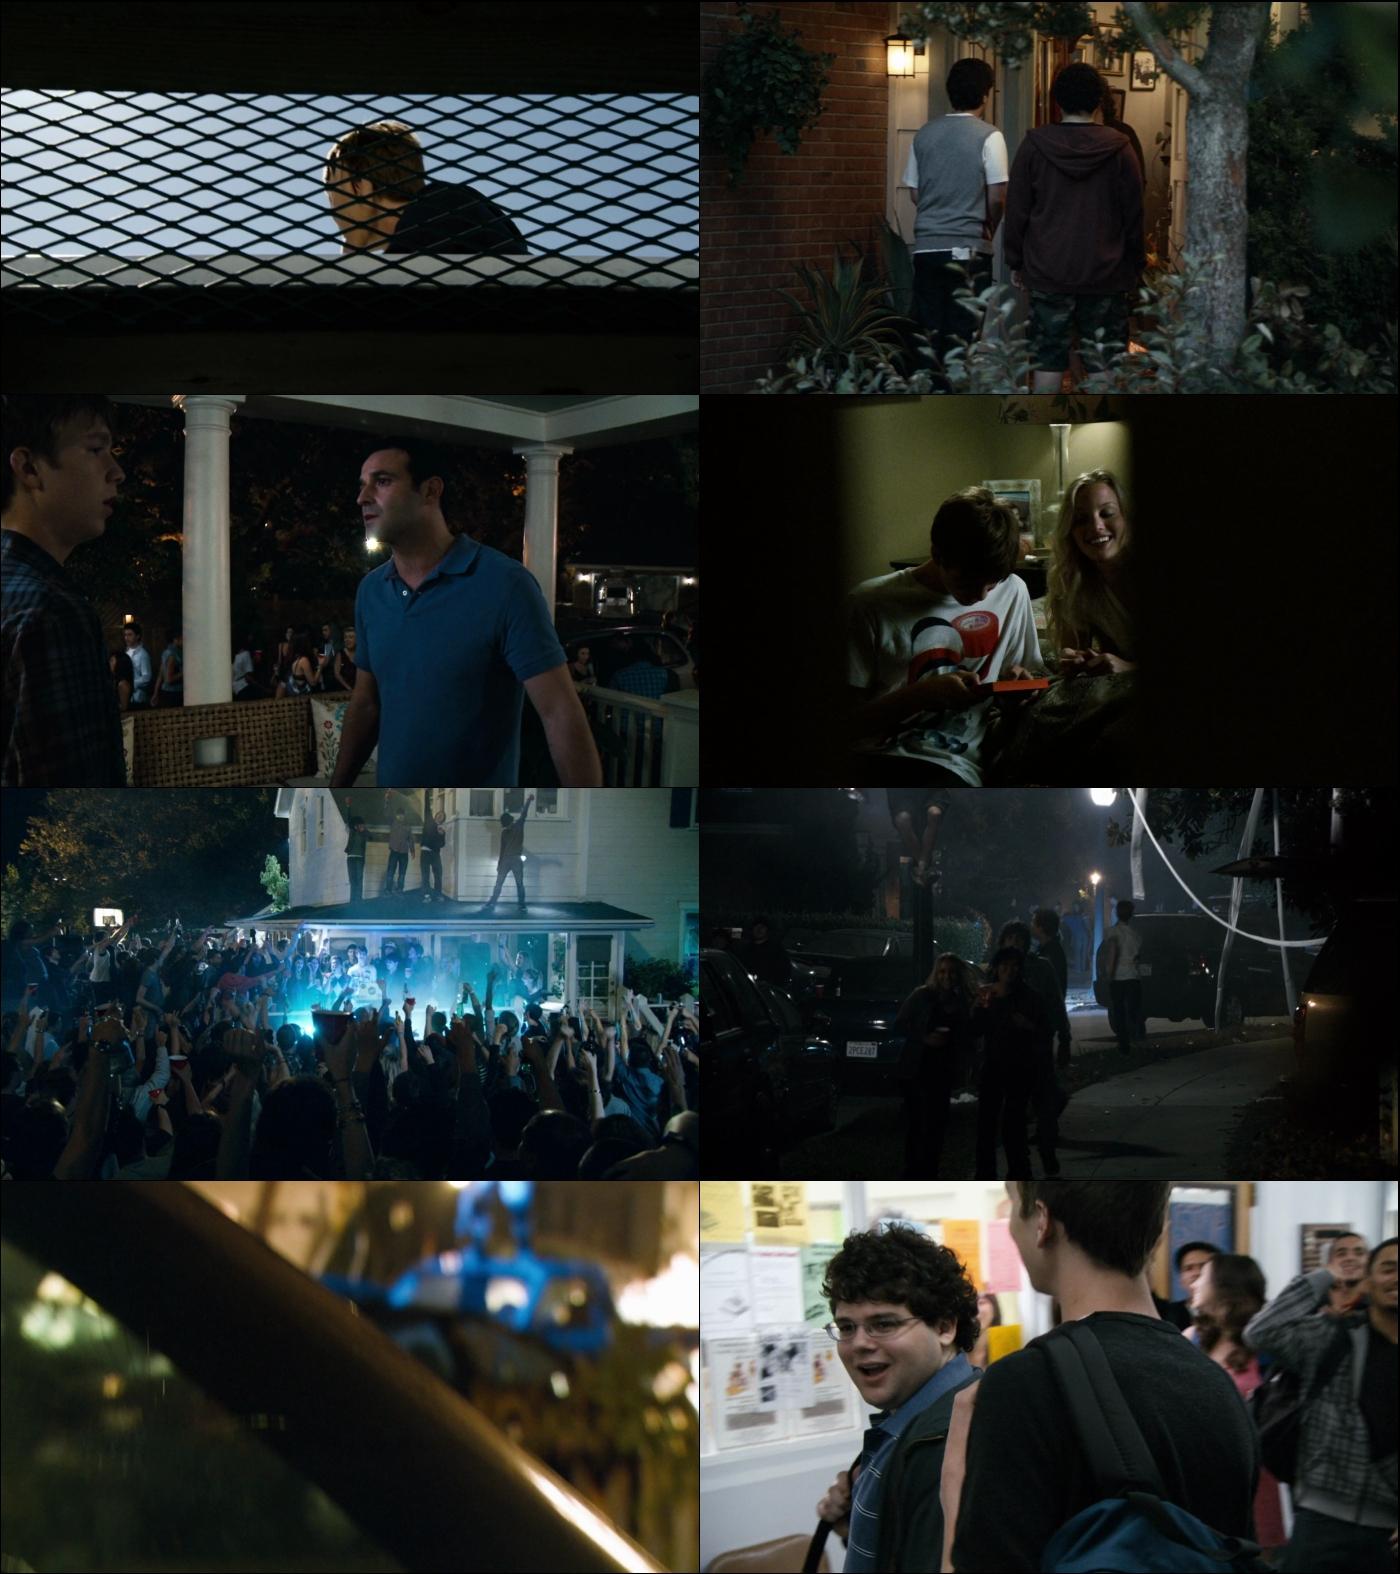 Proyecto X 1080p Latino Ingles Mega Megapeliculasrip Megapeliculasrip